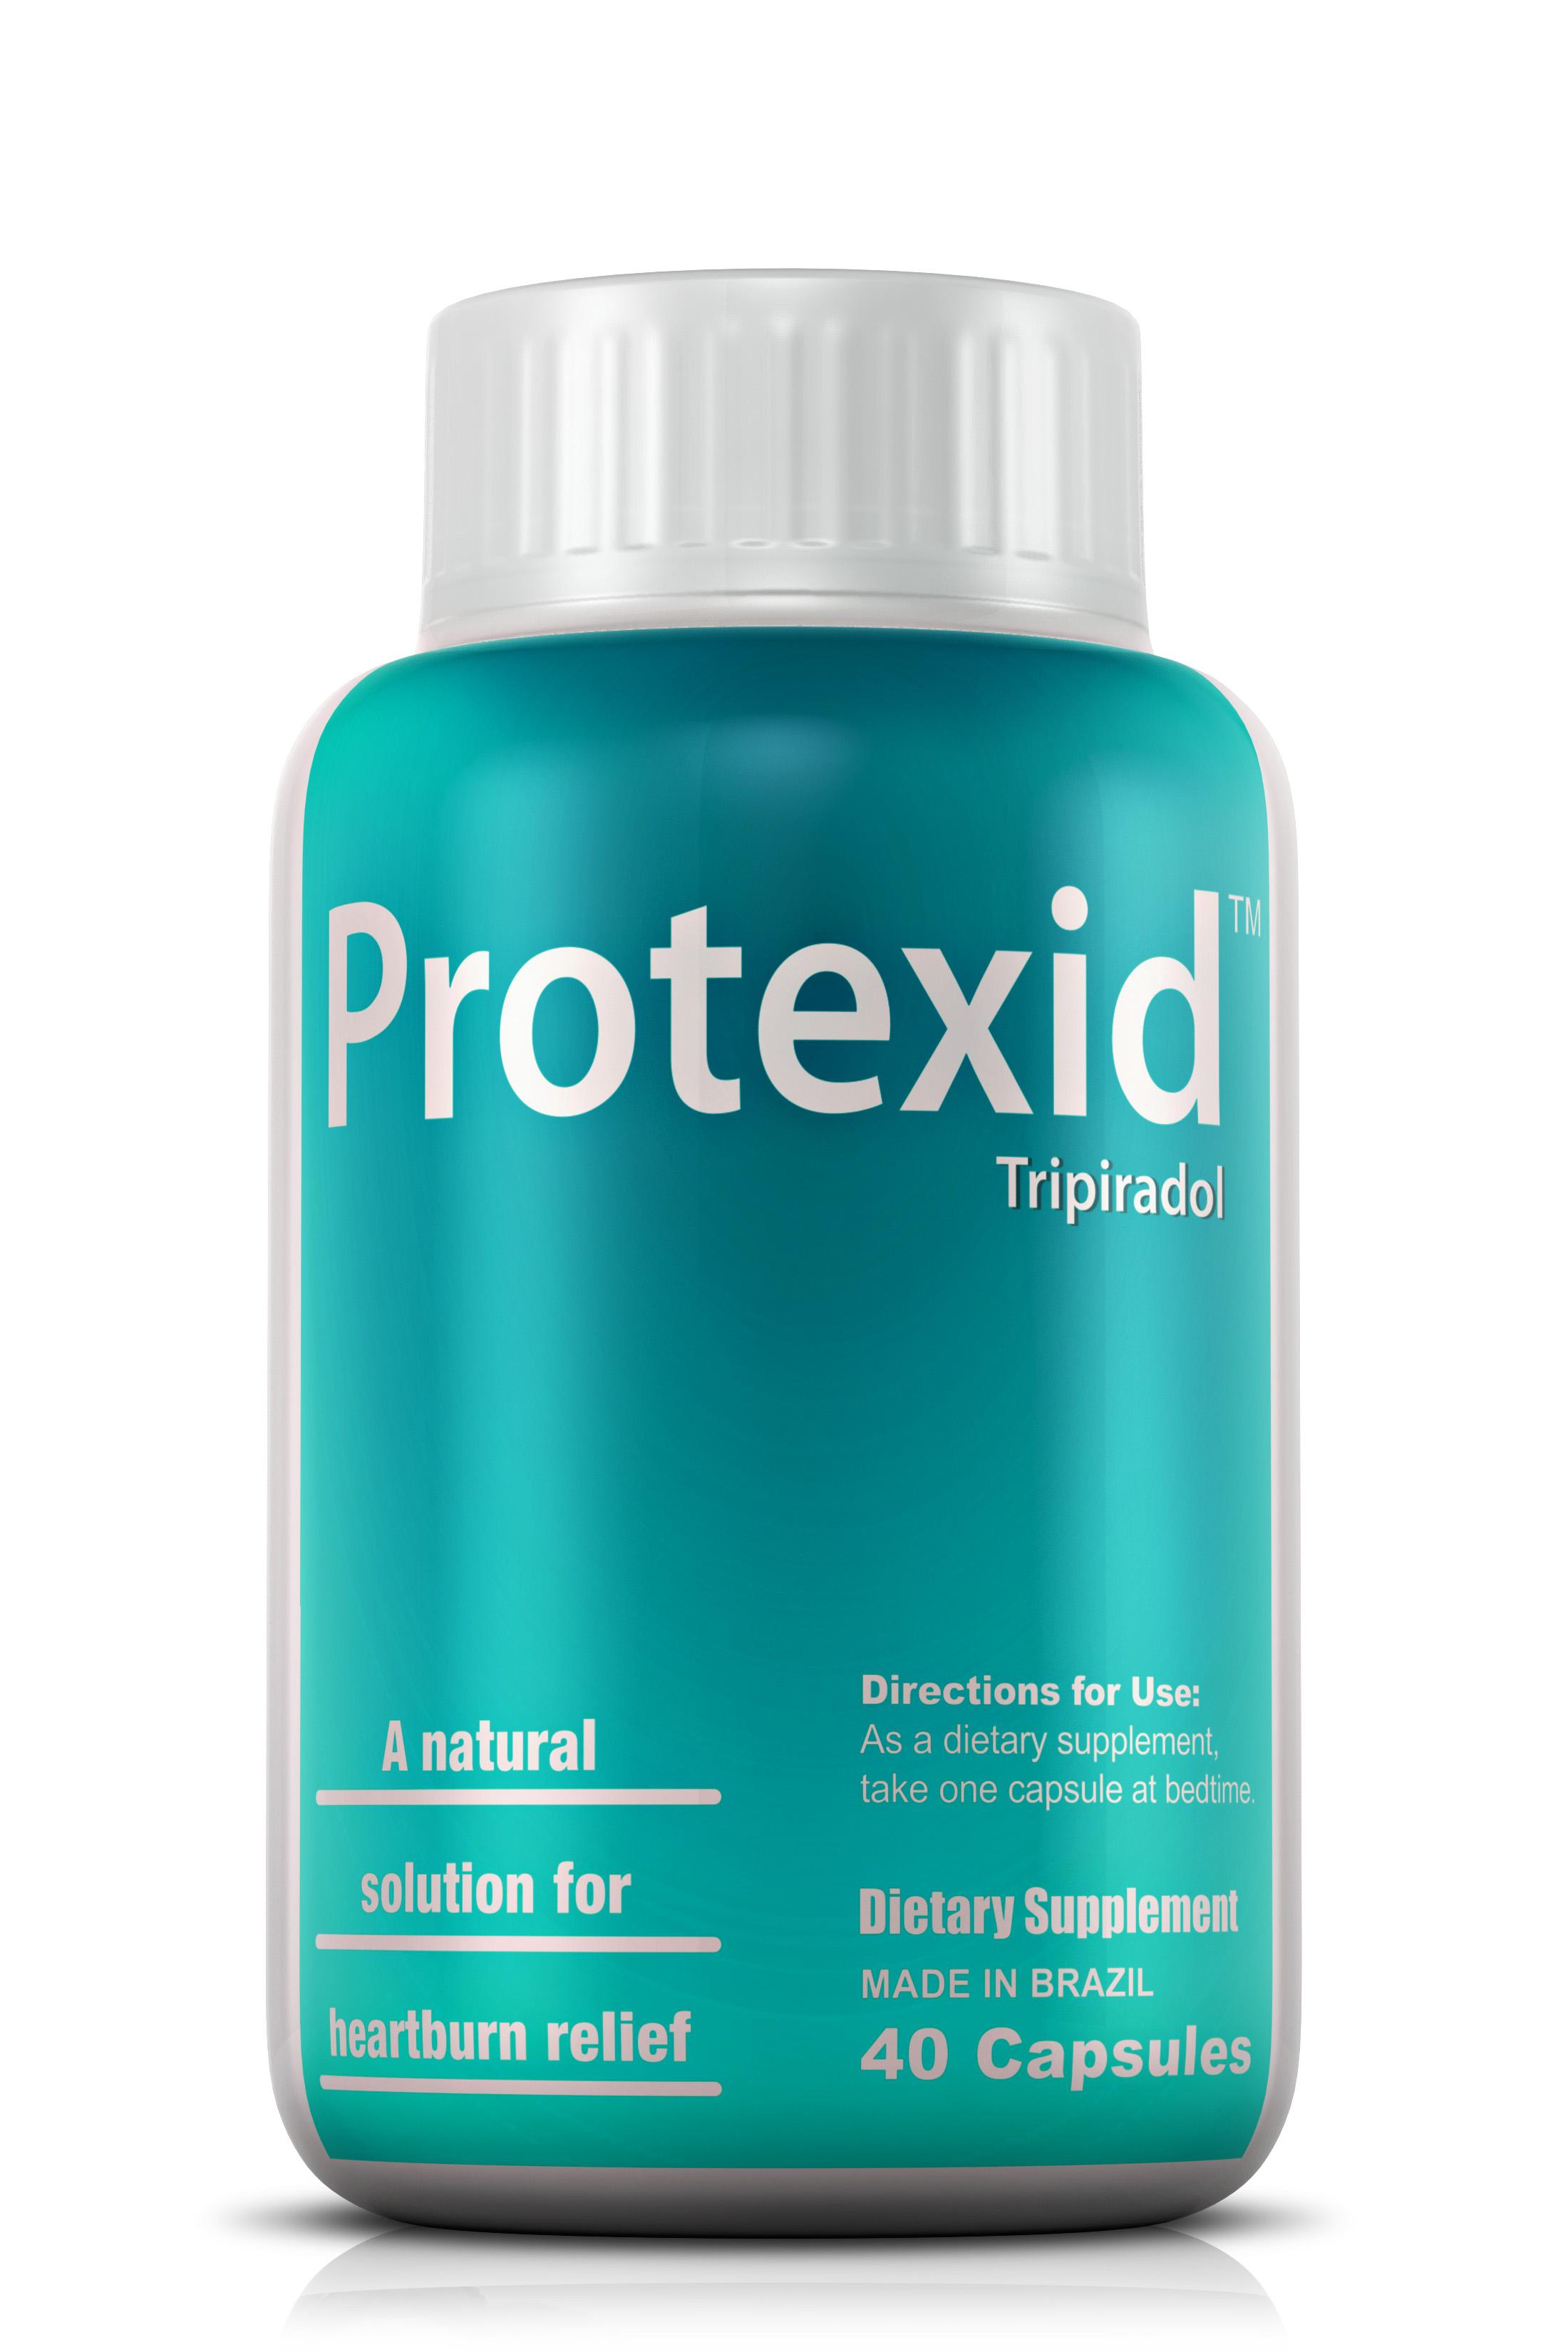 Protexid